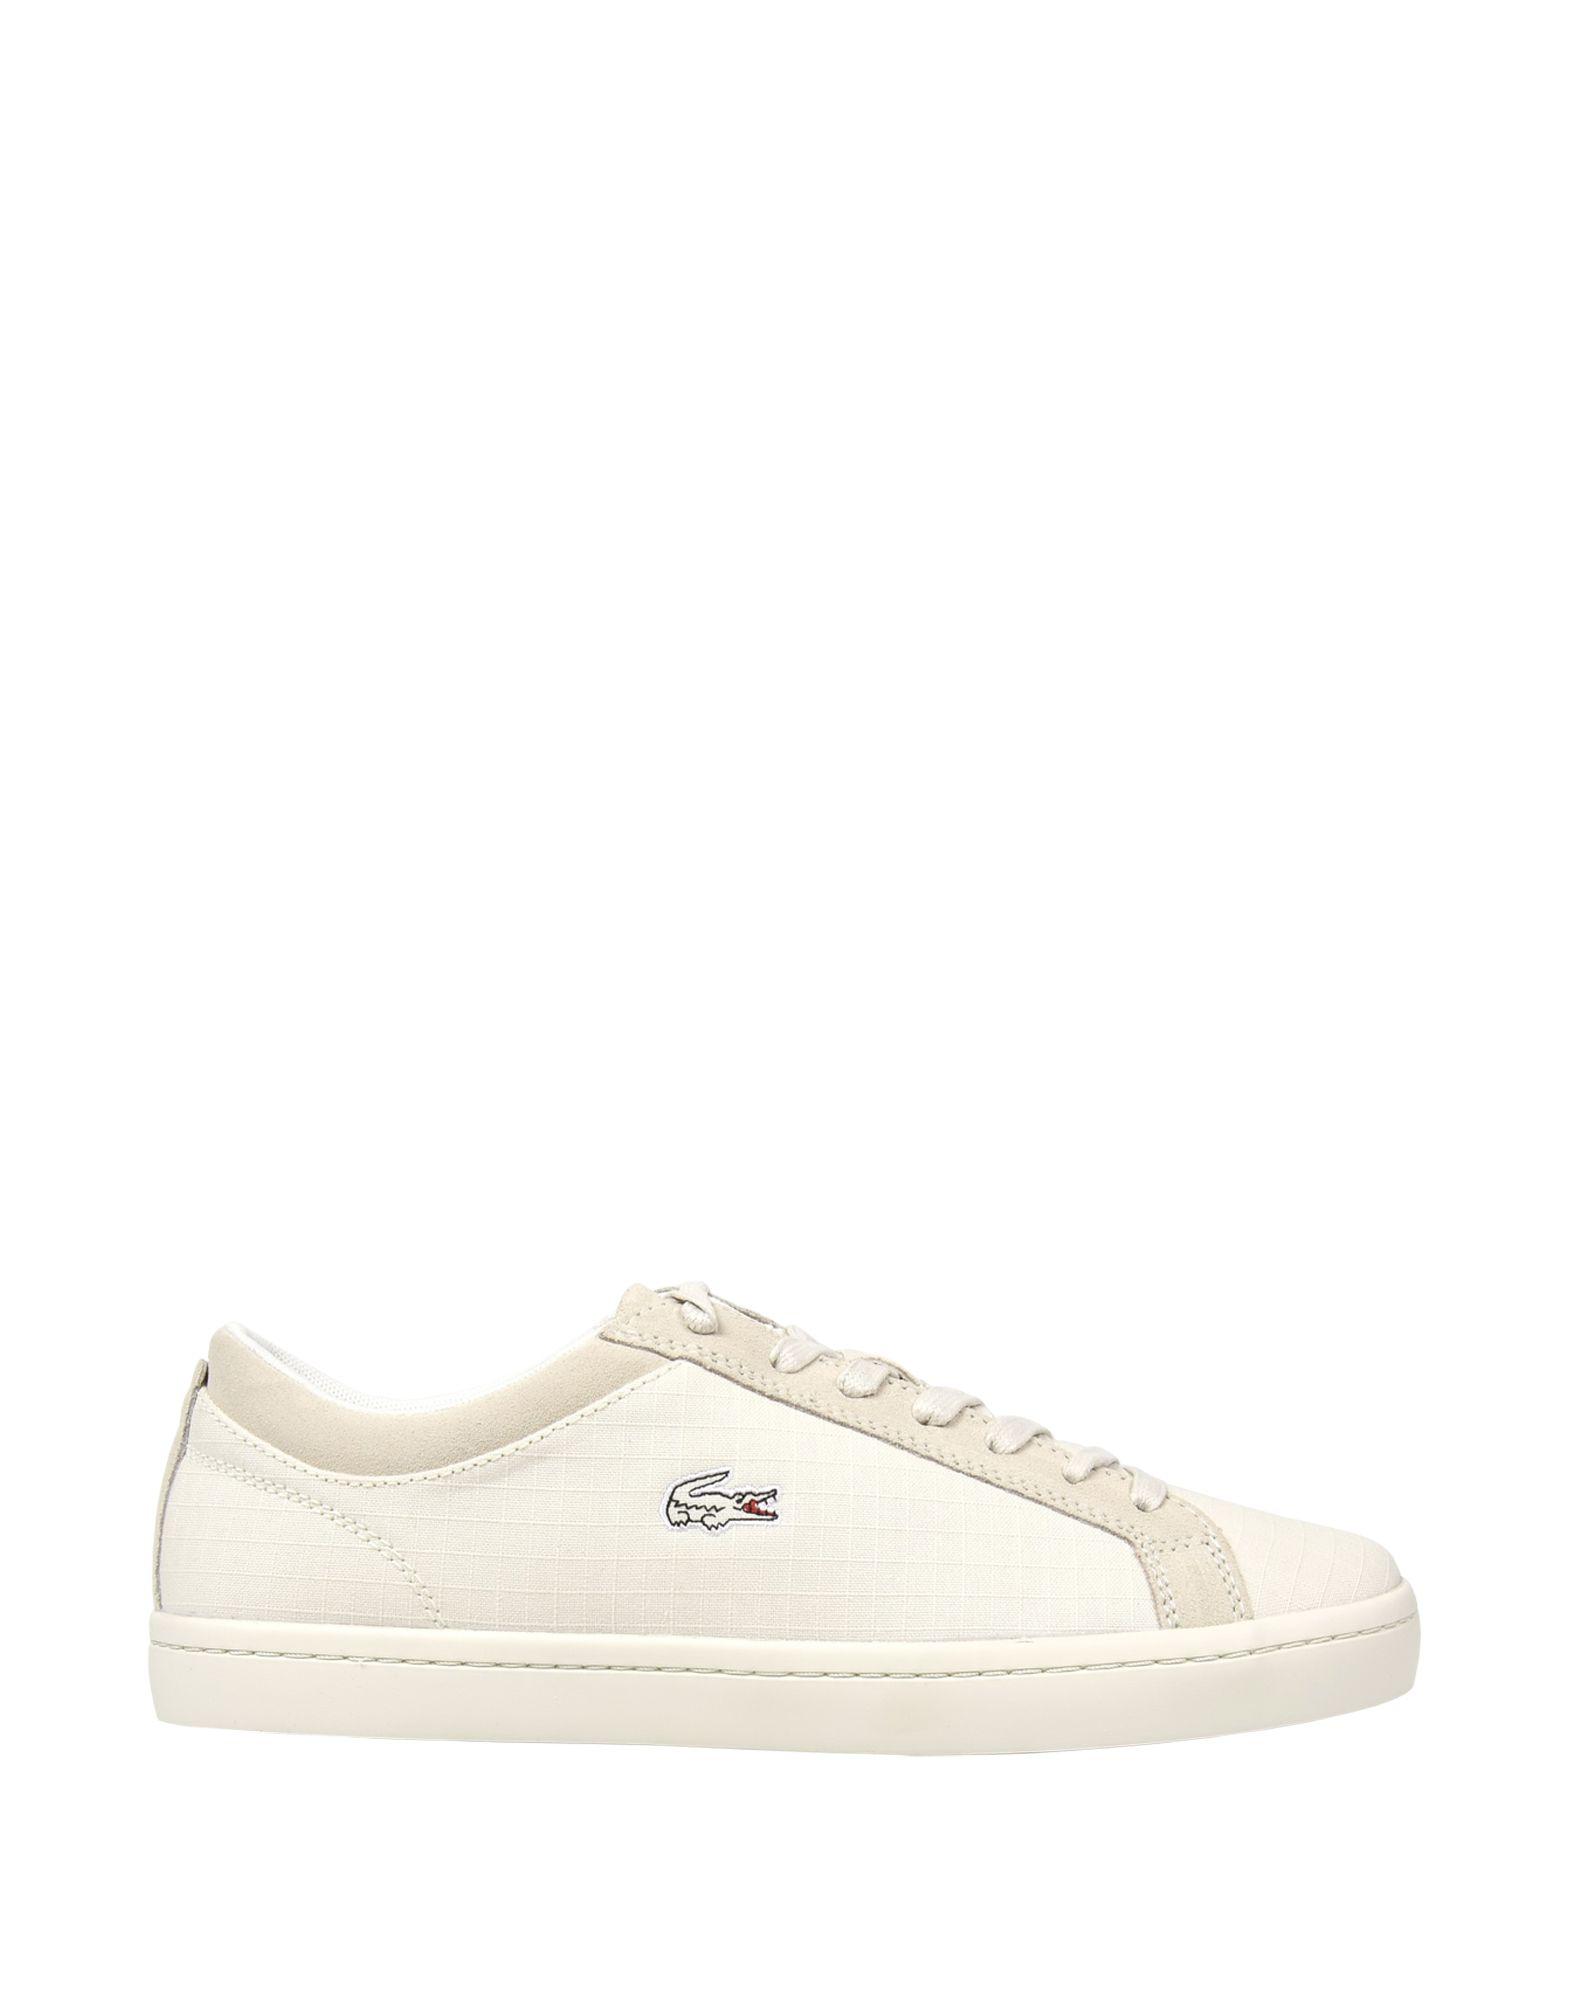 Rabatt 117 echte Schuhe Lacoste Straightset 117 Rabatt 2  11210771XF 1acf70